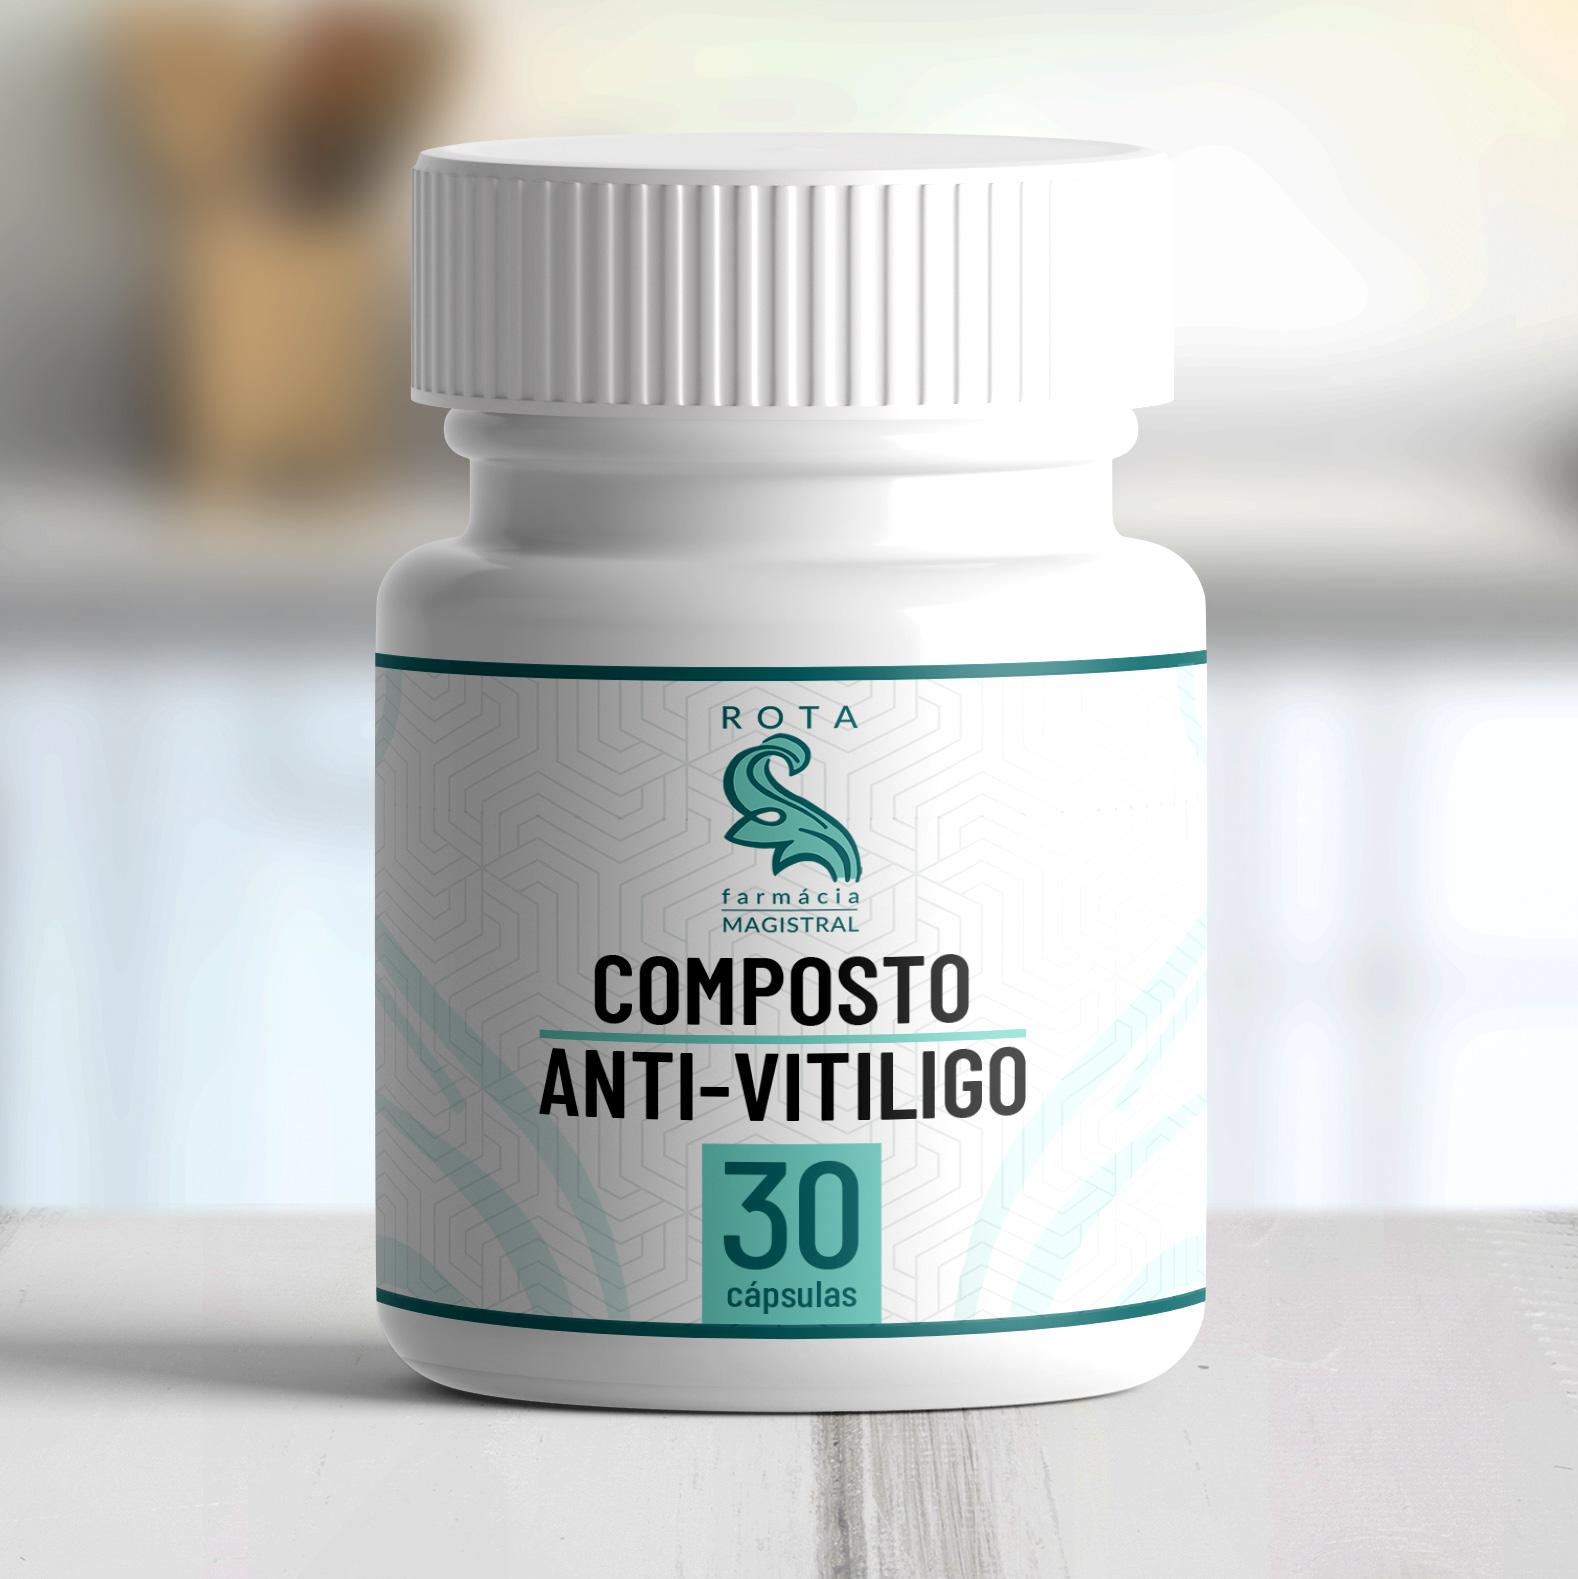 Composto Anti-Vitiligo 30 cápsulas